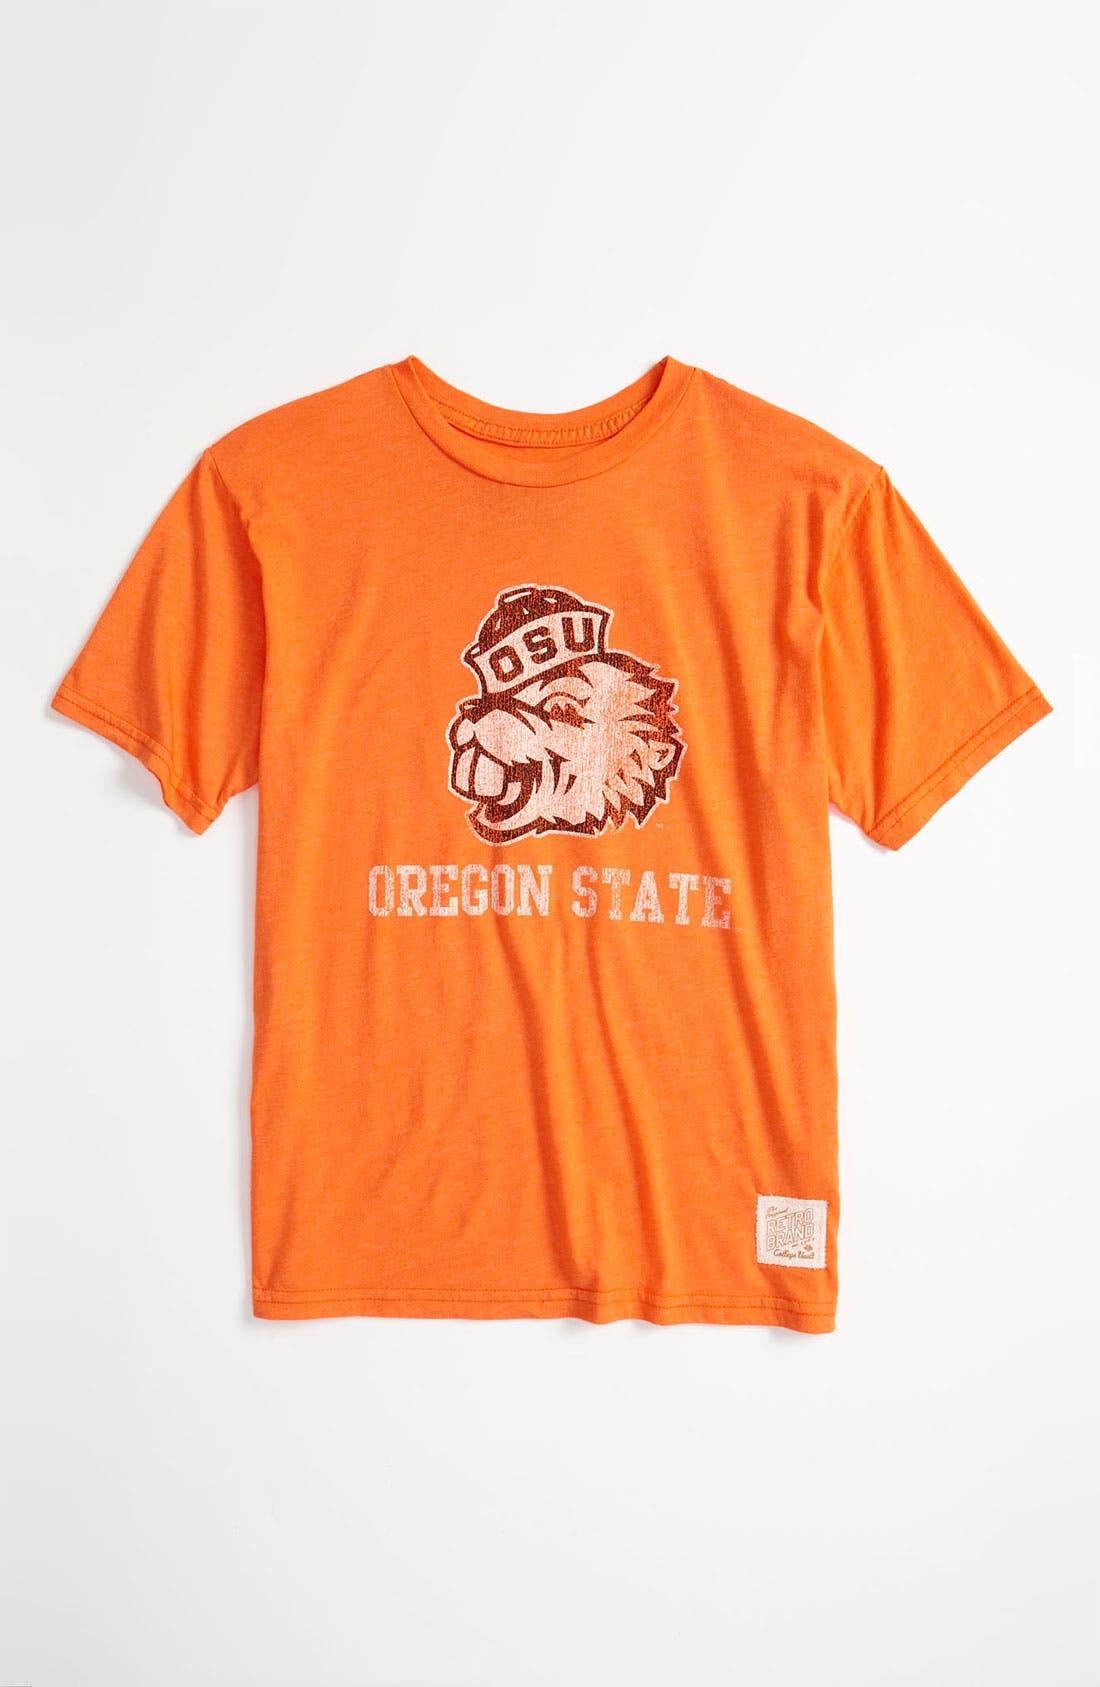 Alternate Image 1 Selected - Retro Brand 'Oregon State' T-Shirt (Big Boys)